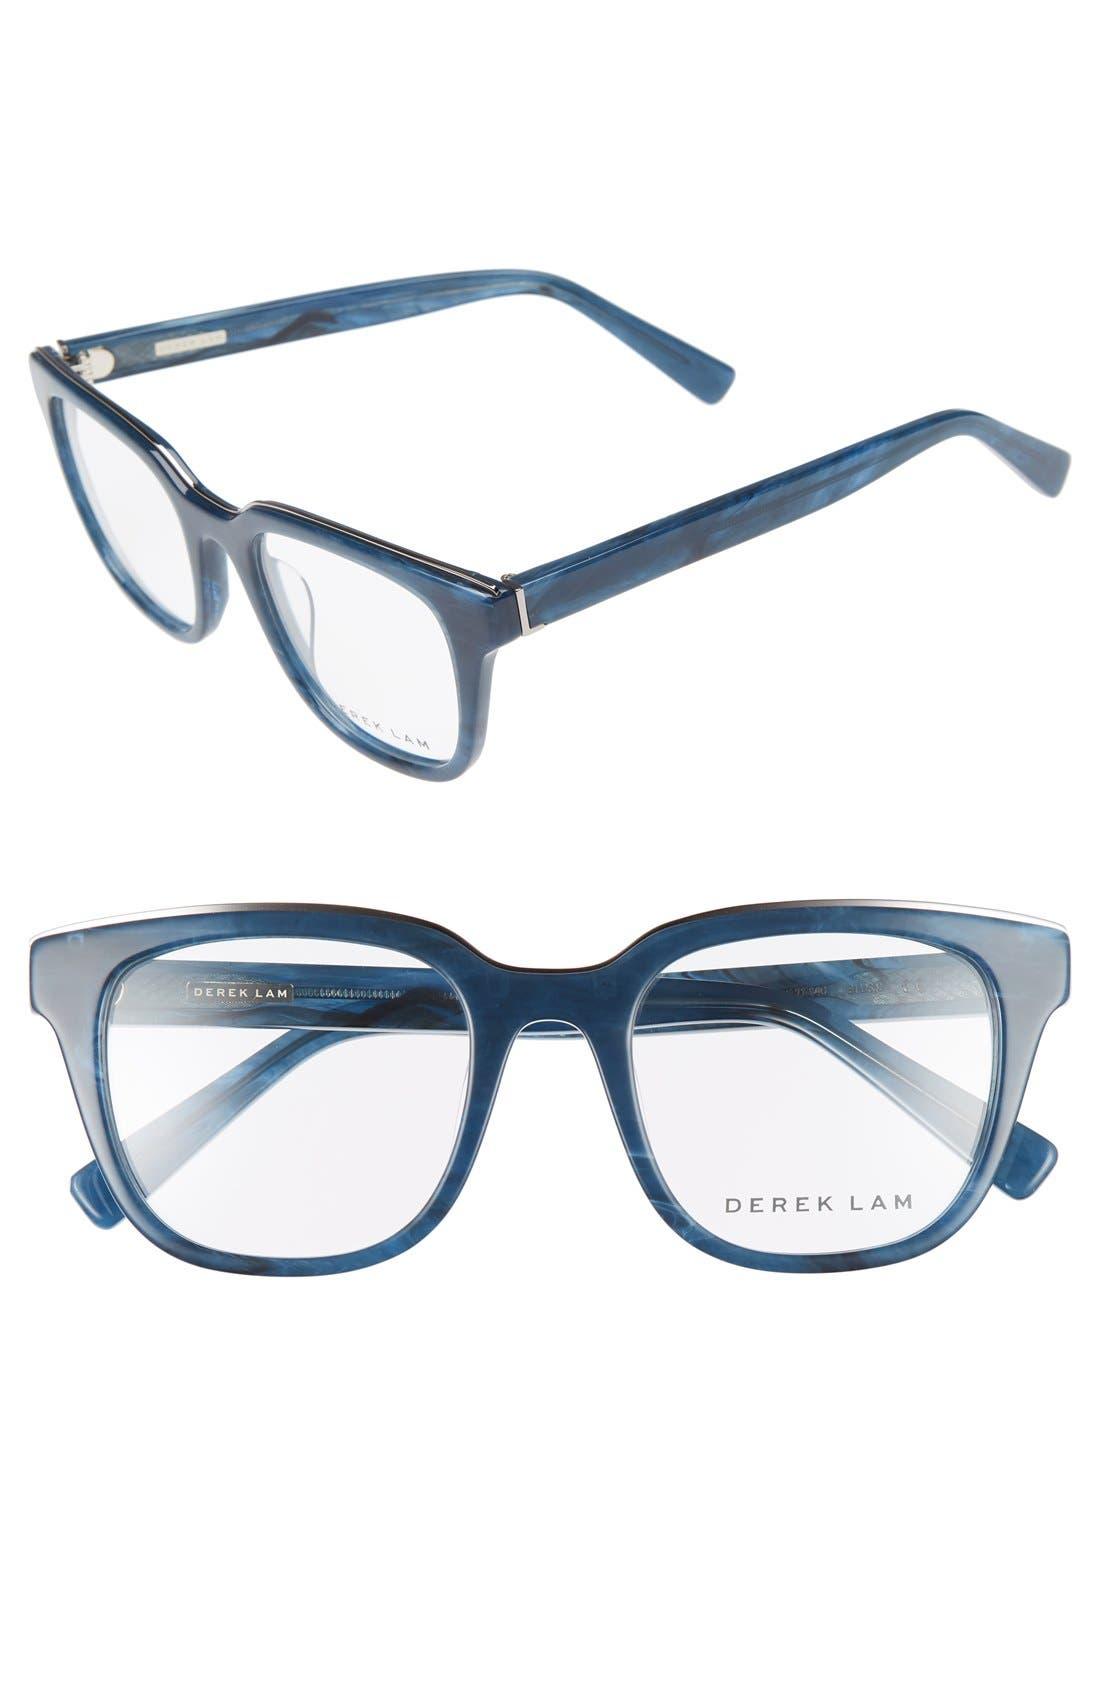 Derek Lam 50mm Optical Glasses